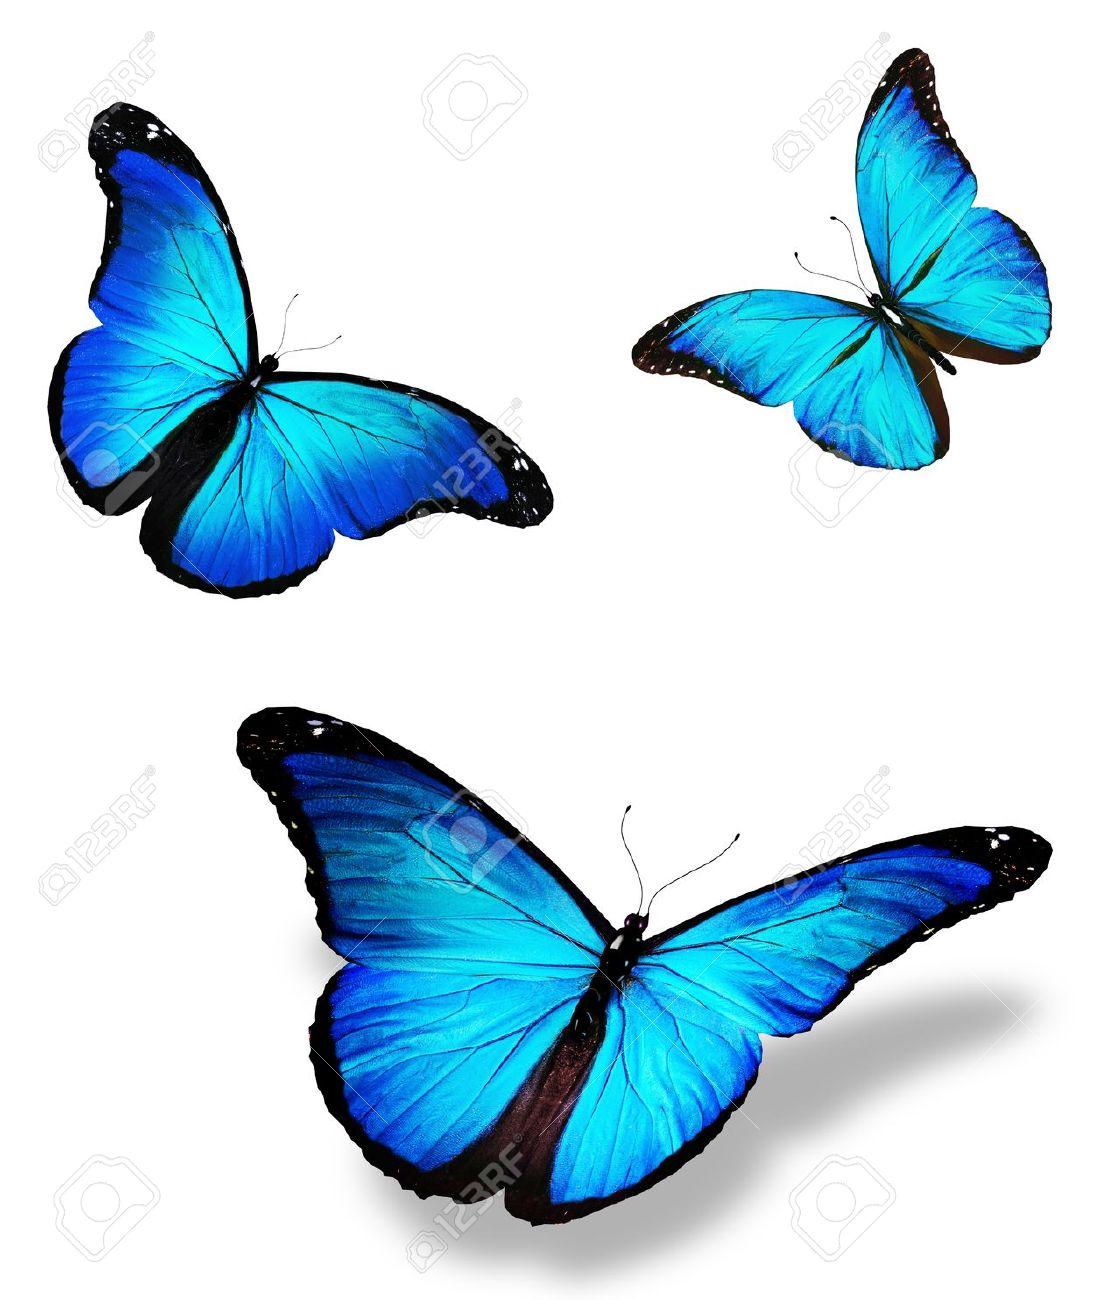 D6d5b4b.png - Butterfly HD PNG